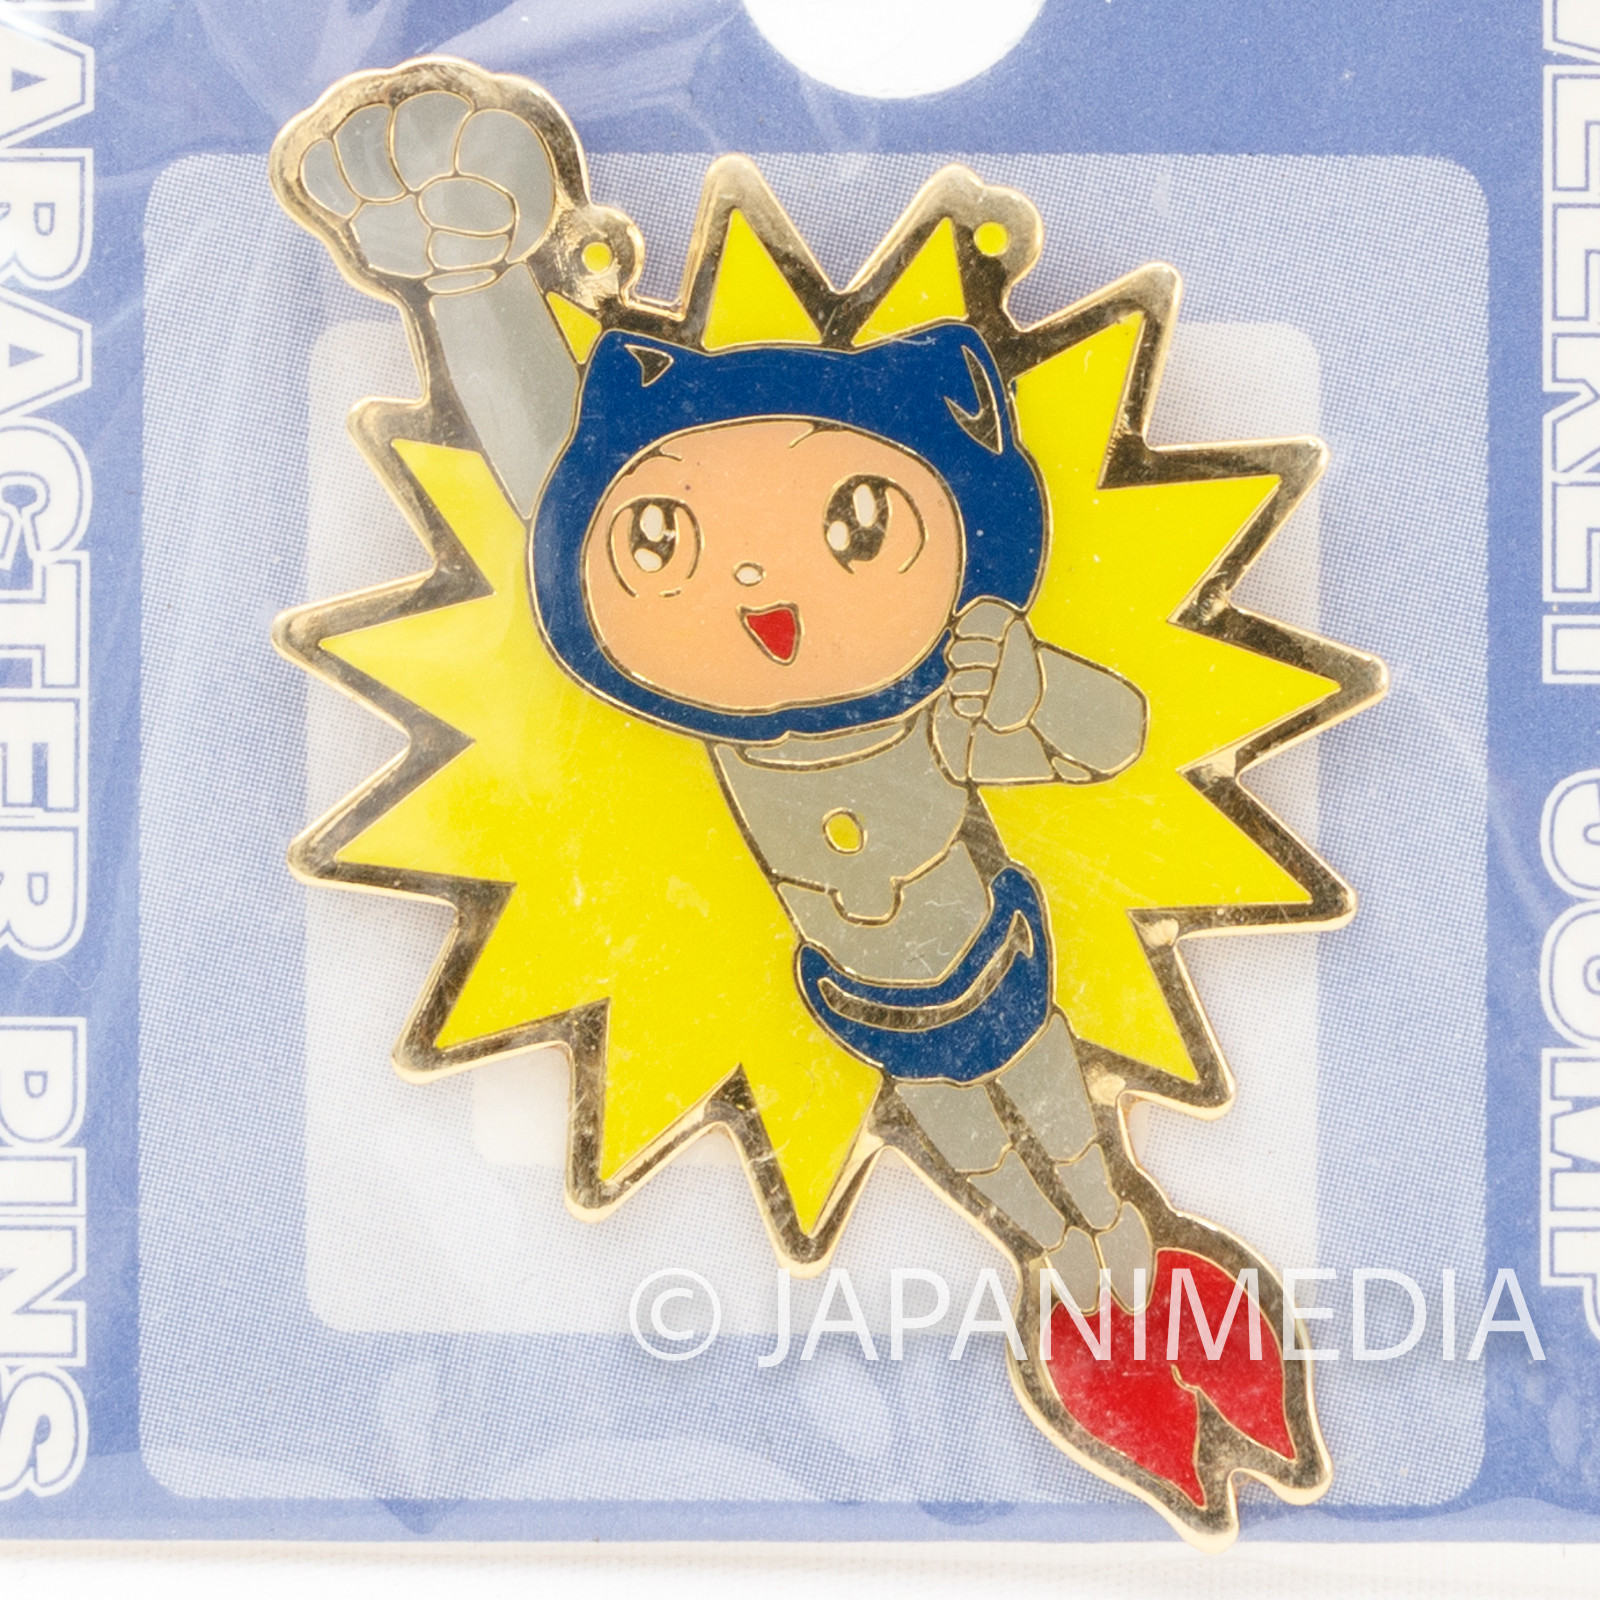 RARE! Pyu to Fuku! Jaguar Hamidento Metal Pins Shueisha Shonen Jump JAPAN MANGA